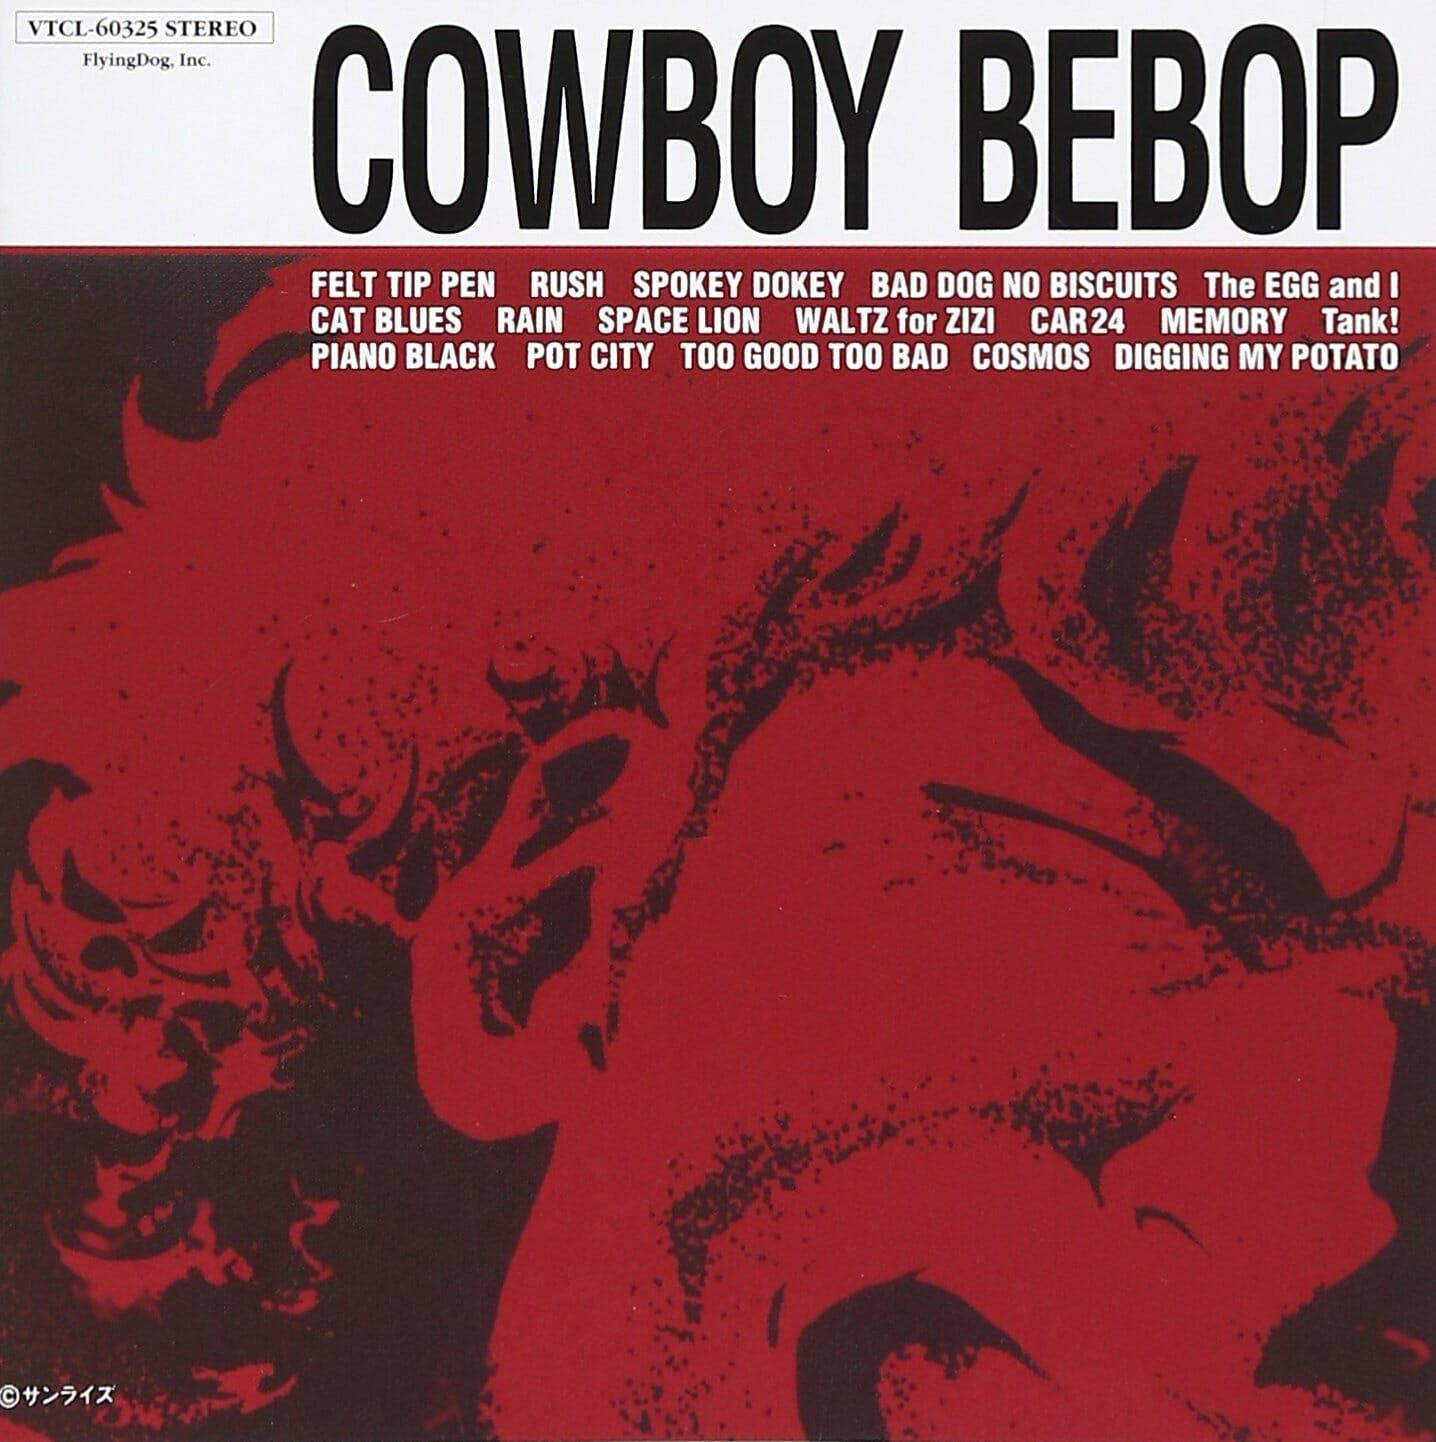 cowboy bebop : soundtrack